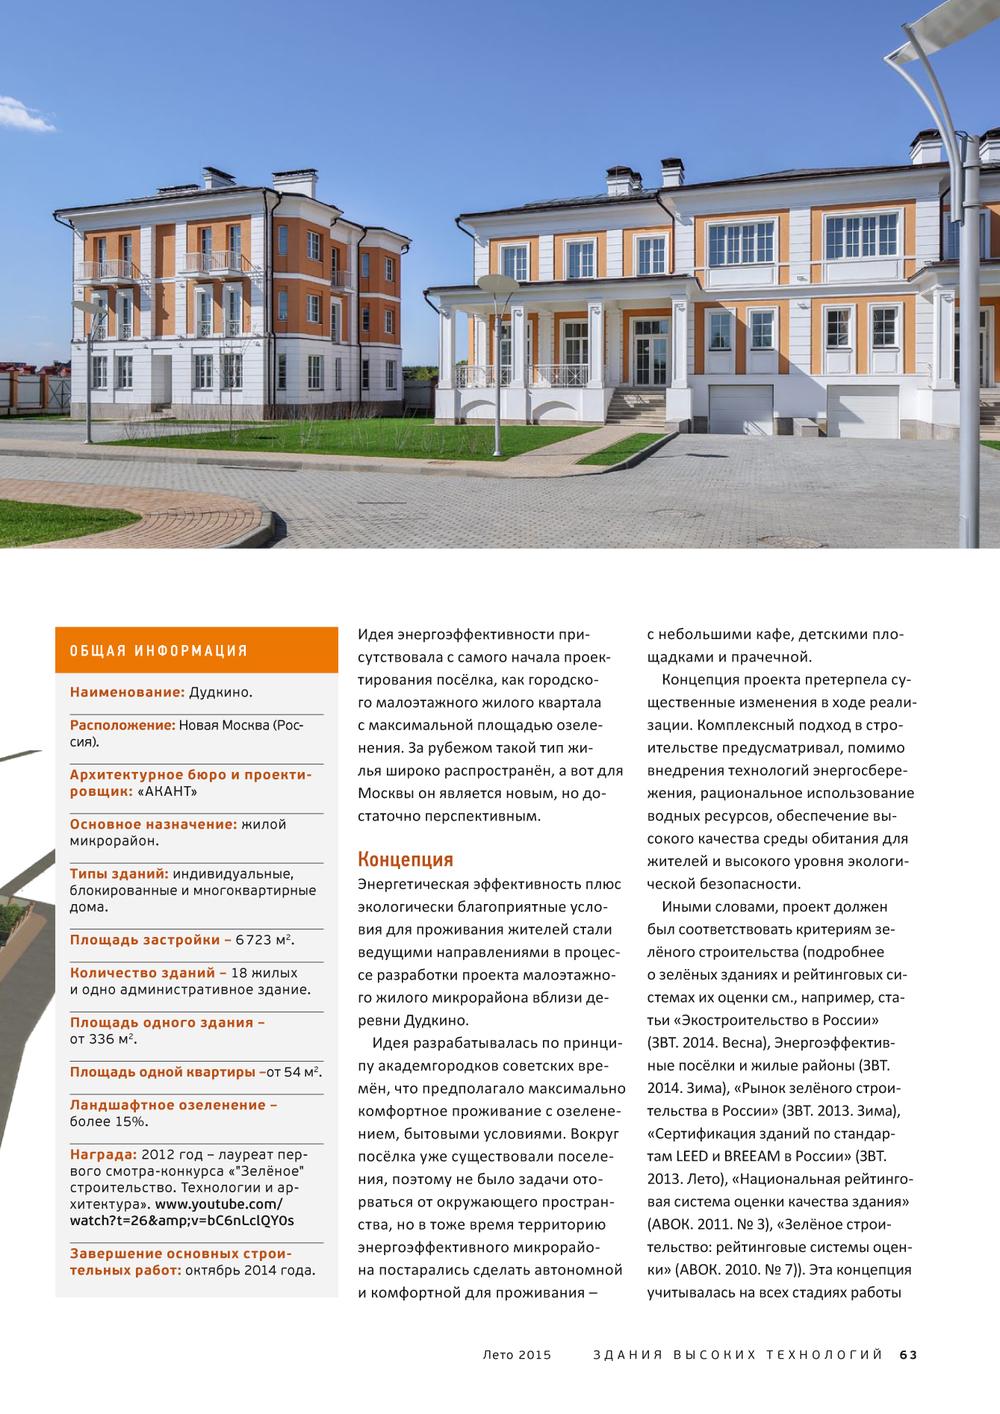 ЗВТ лето 2015 (Дудкино)-2.jpg